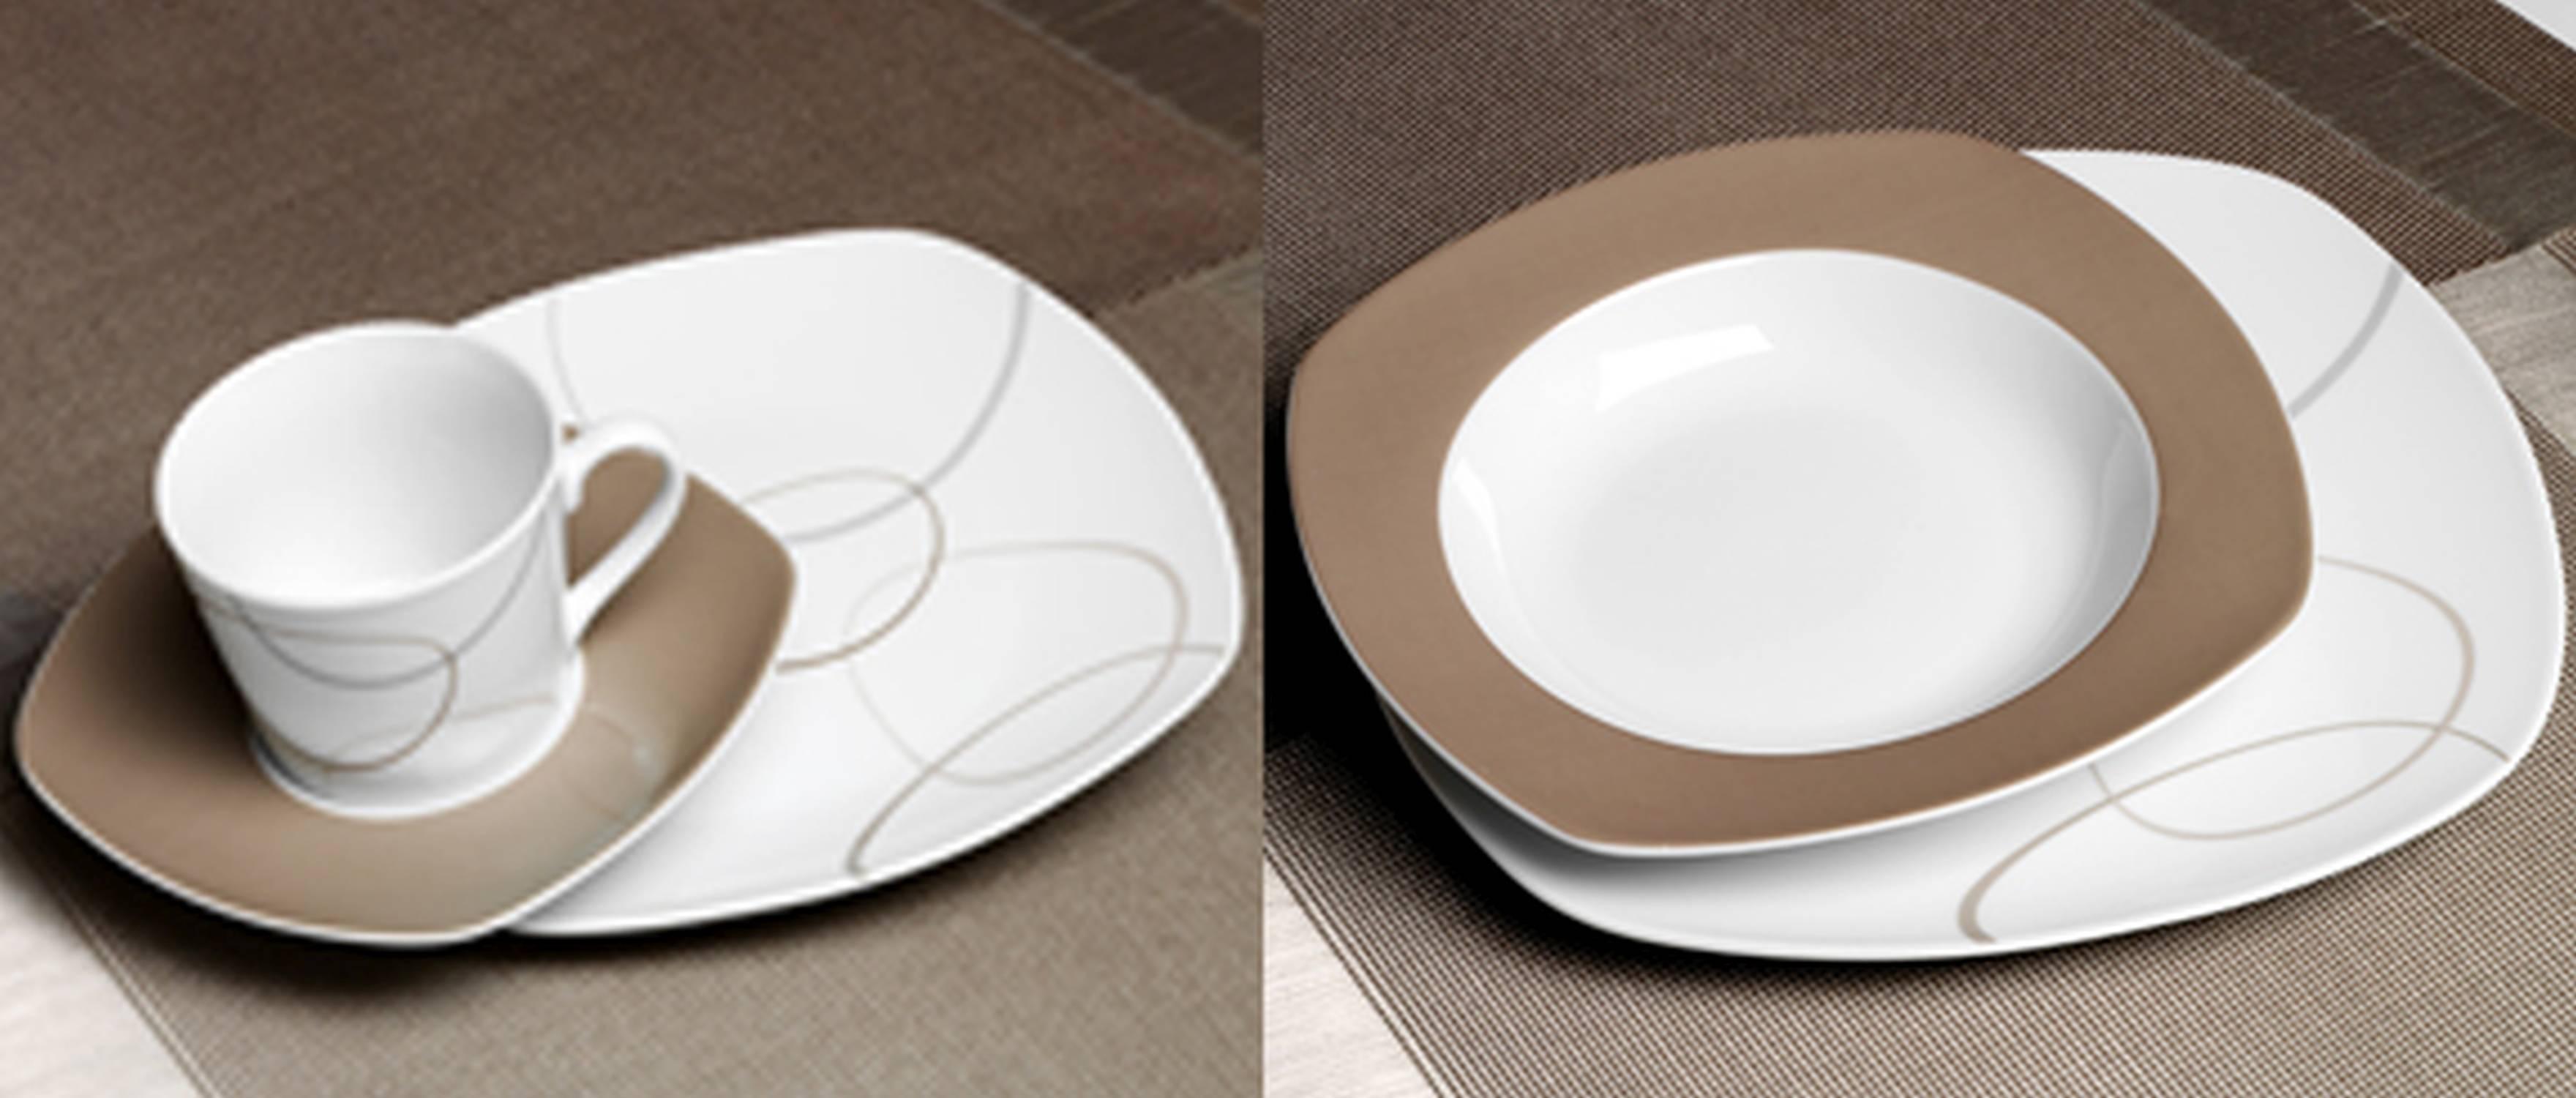 ritzenhoff breker kombiservice flirt porzellan serie alina marron 30 tlg neu ebay. Black Bedroom Furniture Sets. Home Design Ideas